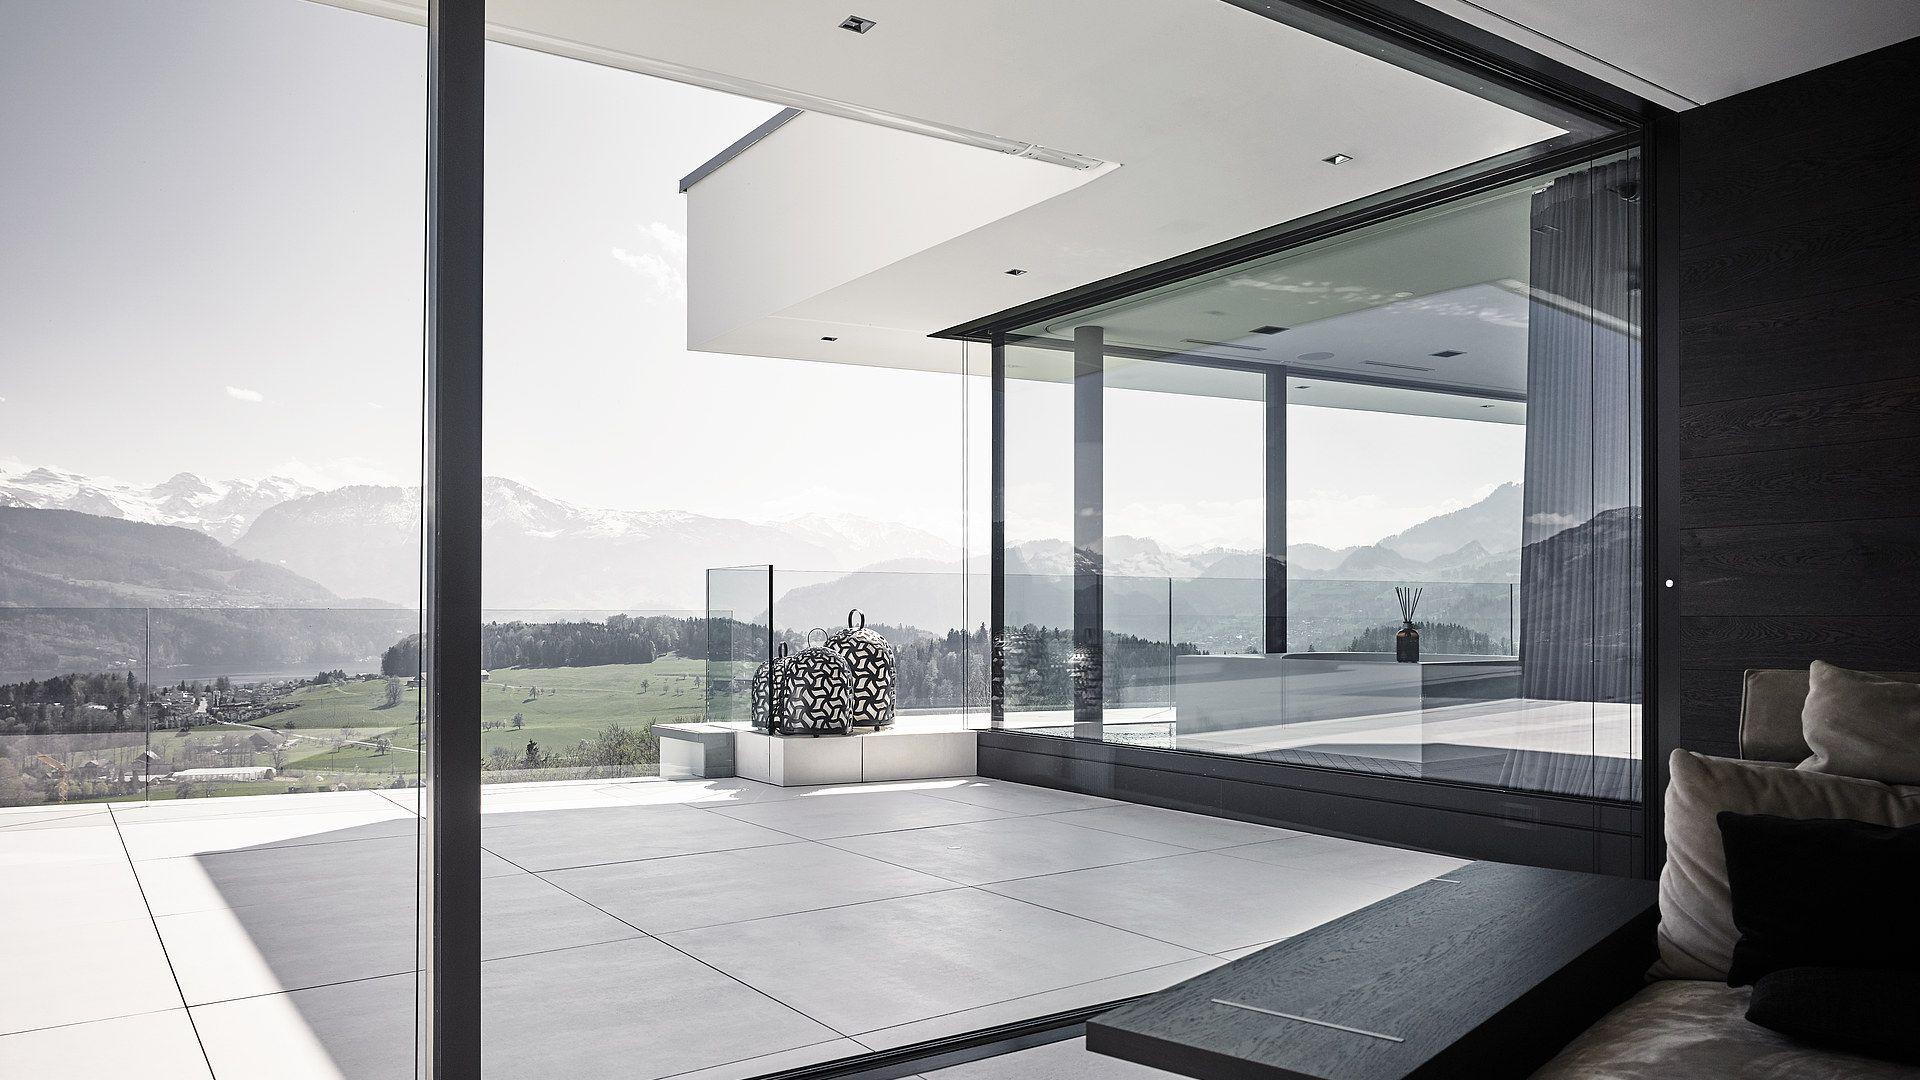 Privathaus Schweiz - air-lux.ch | Architecture inspirations ...